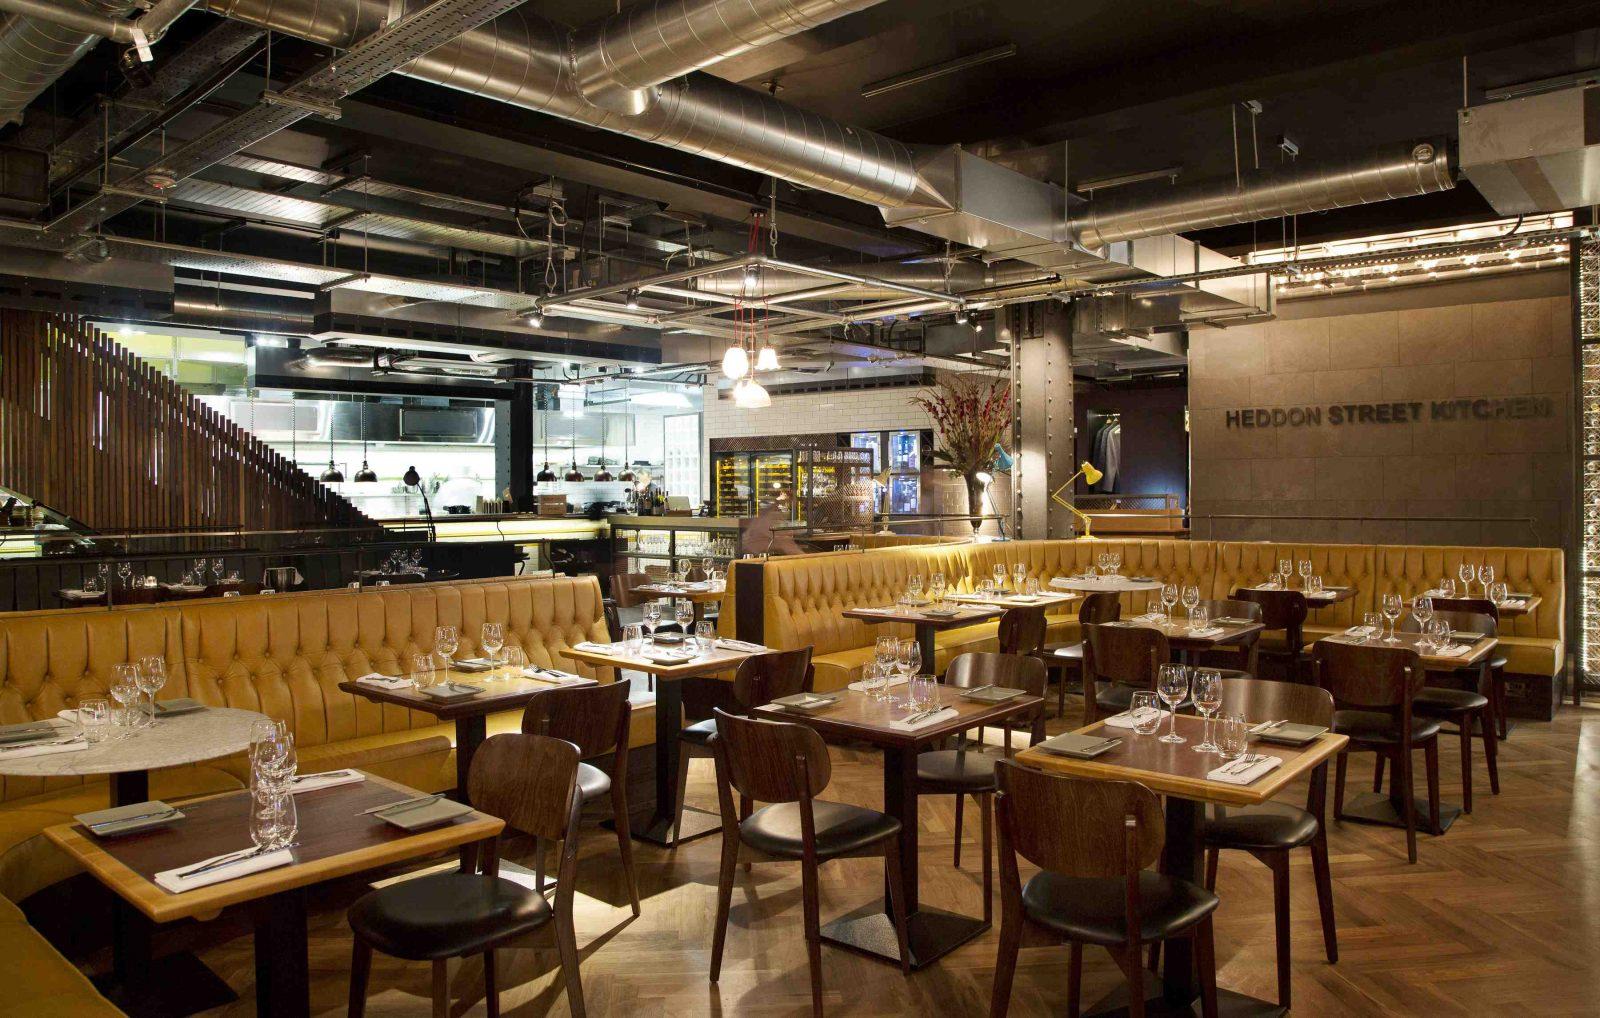 Heddon Street Kitchen Gordon Ramsay Ideal Magazine